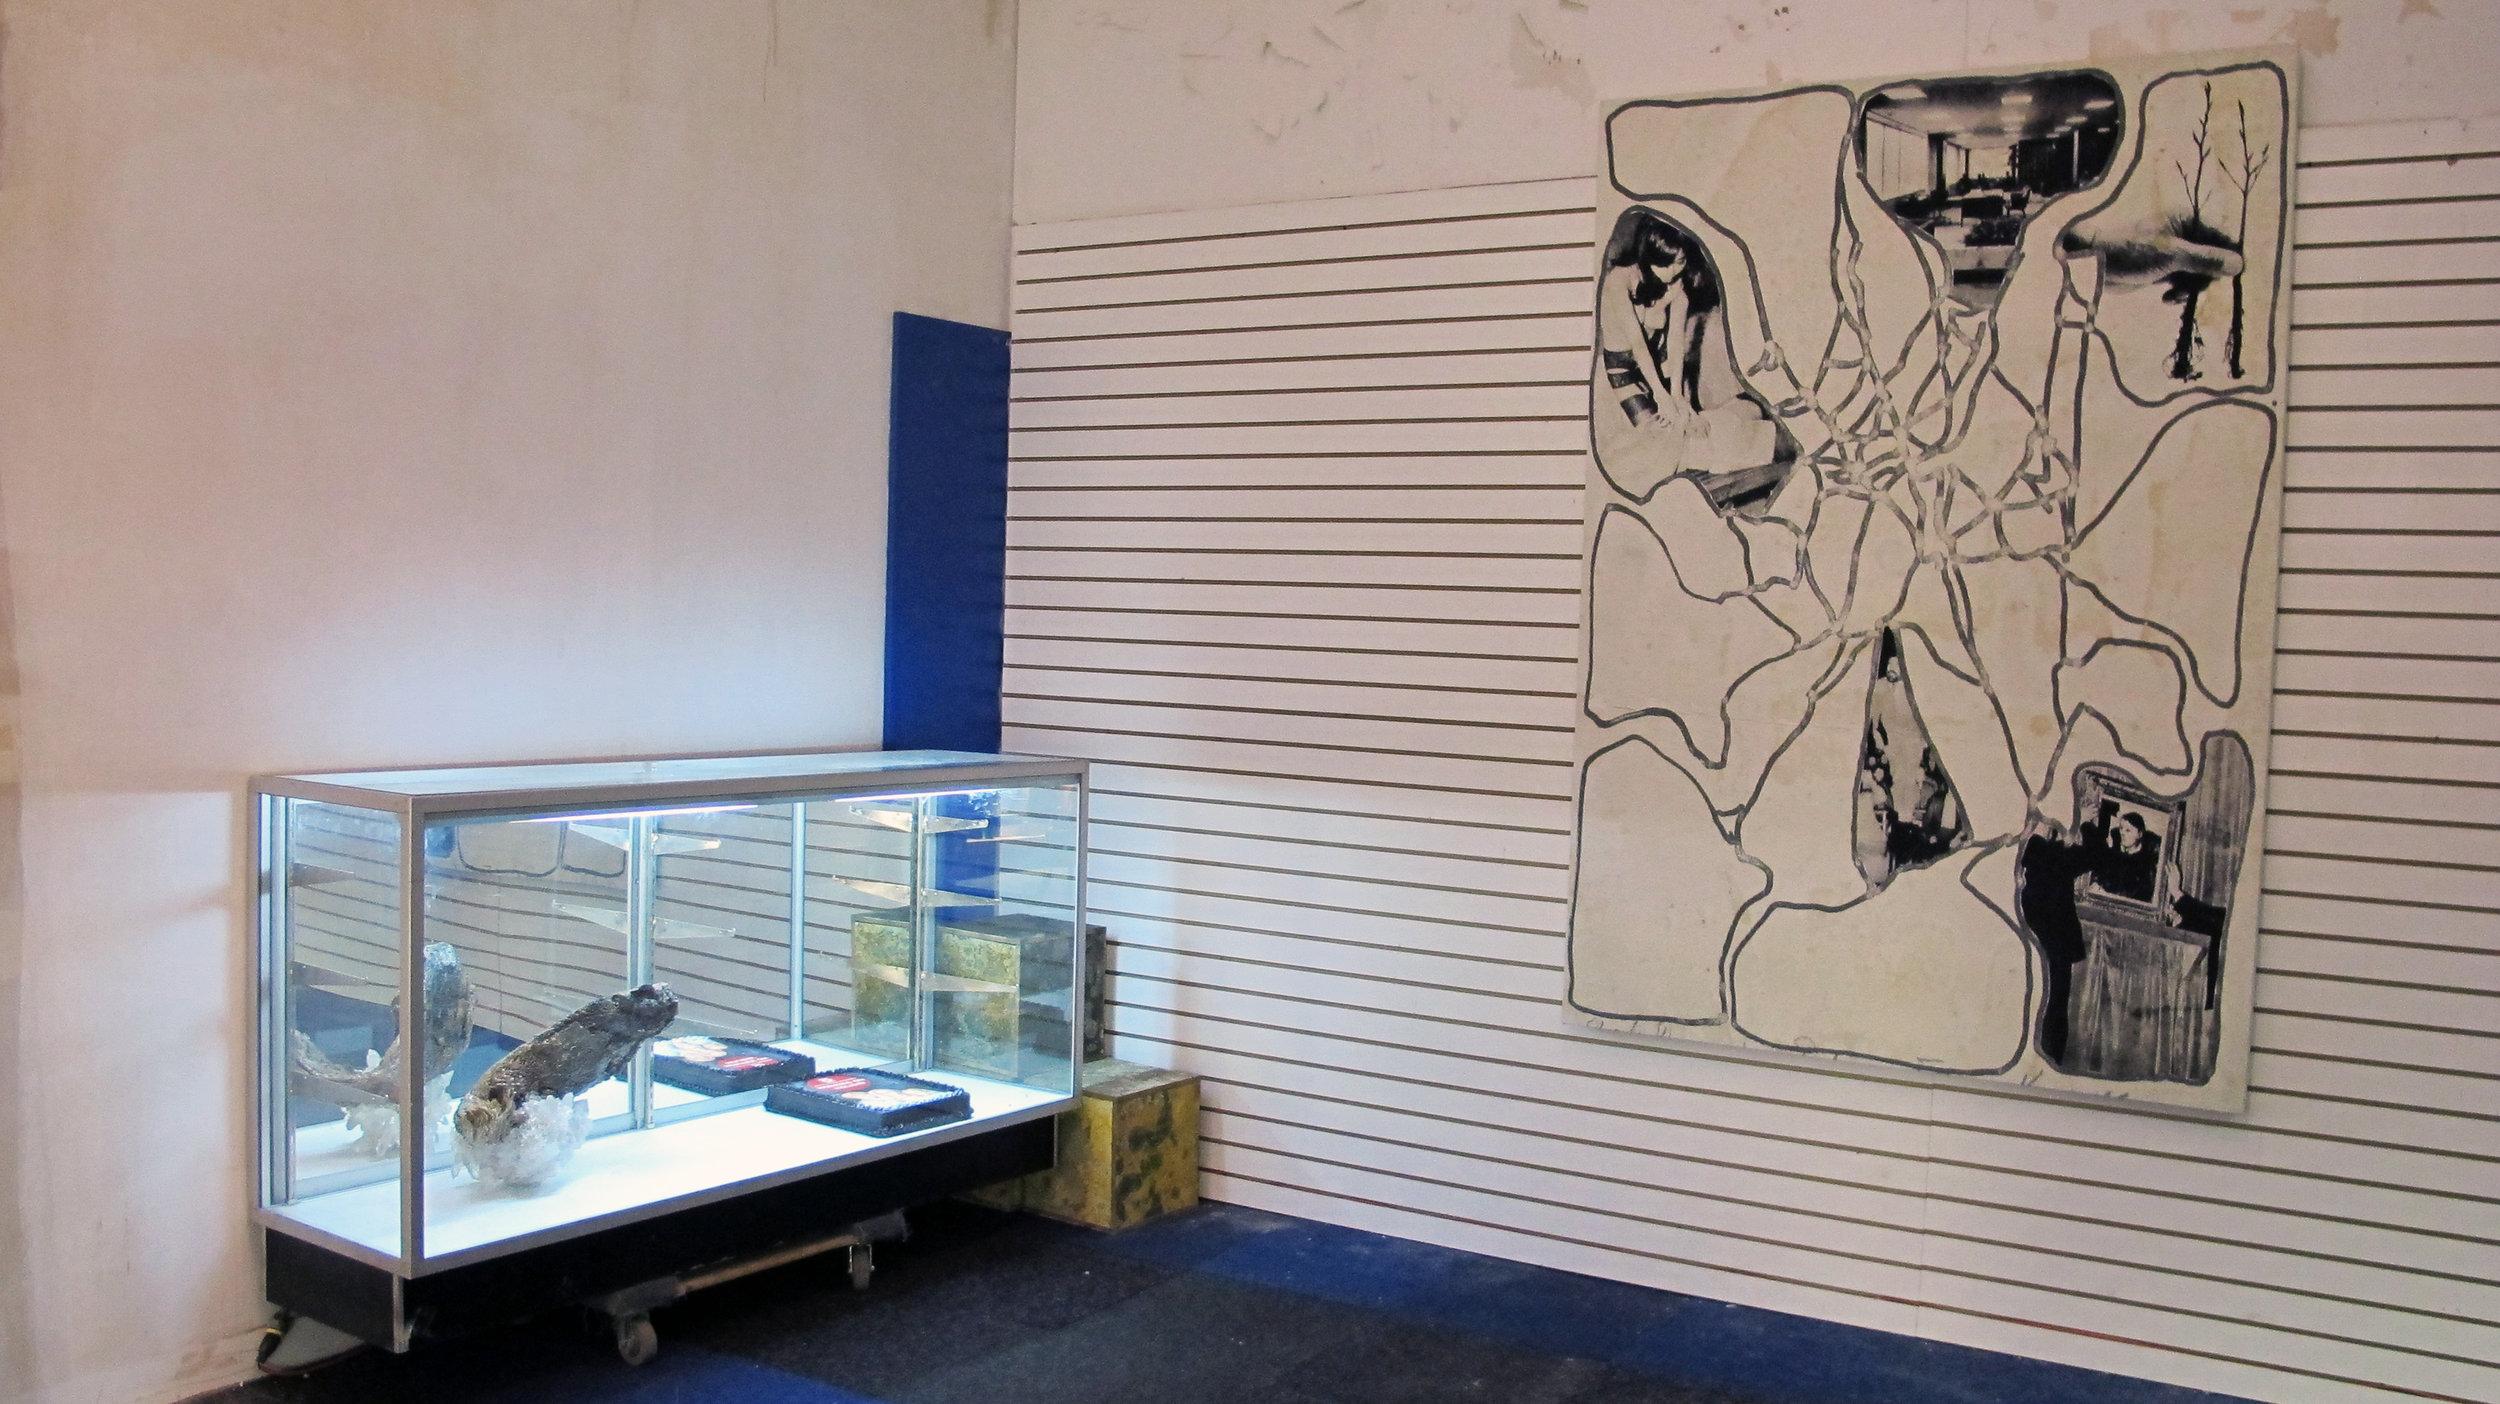 Freeman-Lowe, PANOPTICUM, Robert Miller Gallery, Installation View 30.JPG